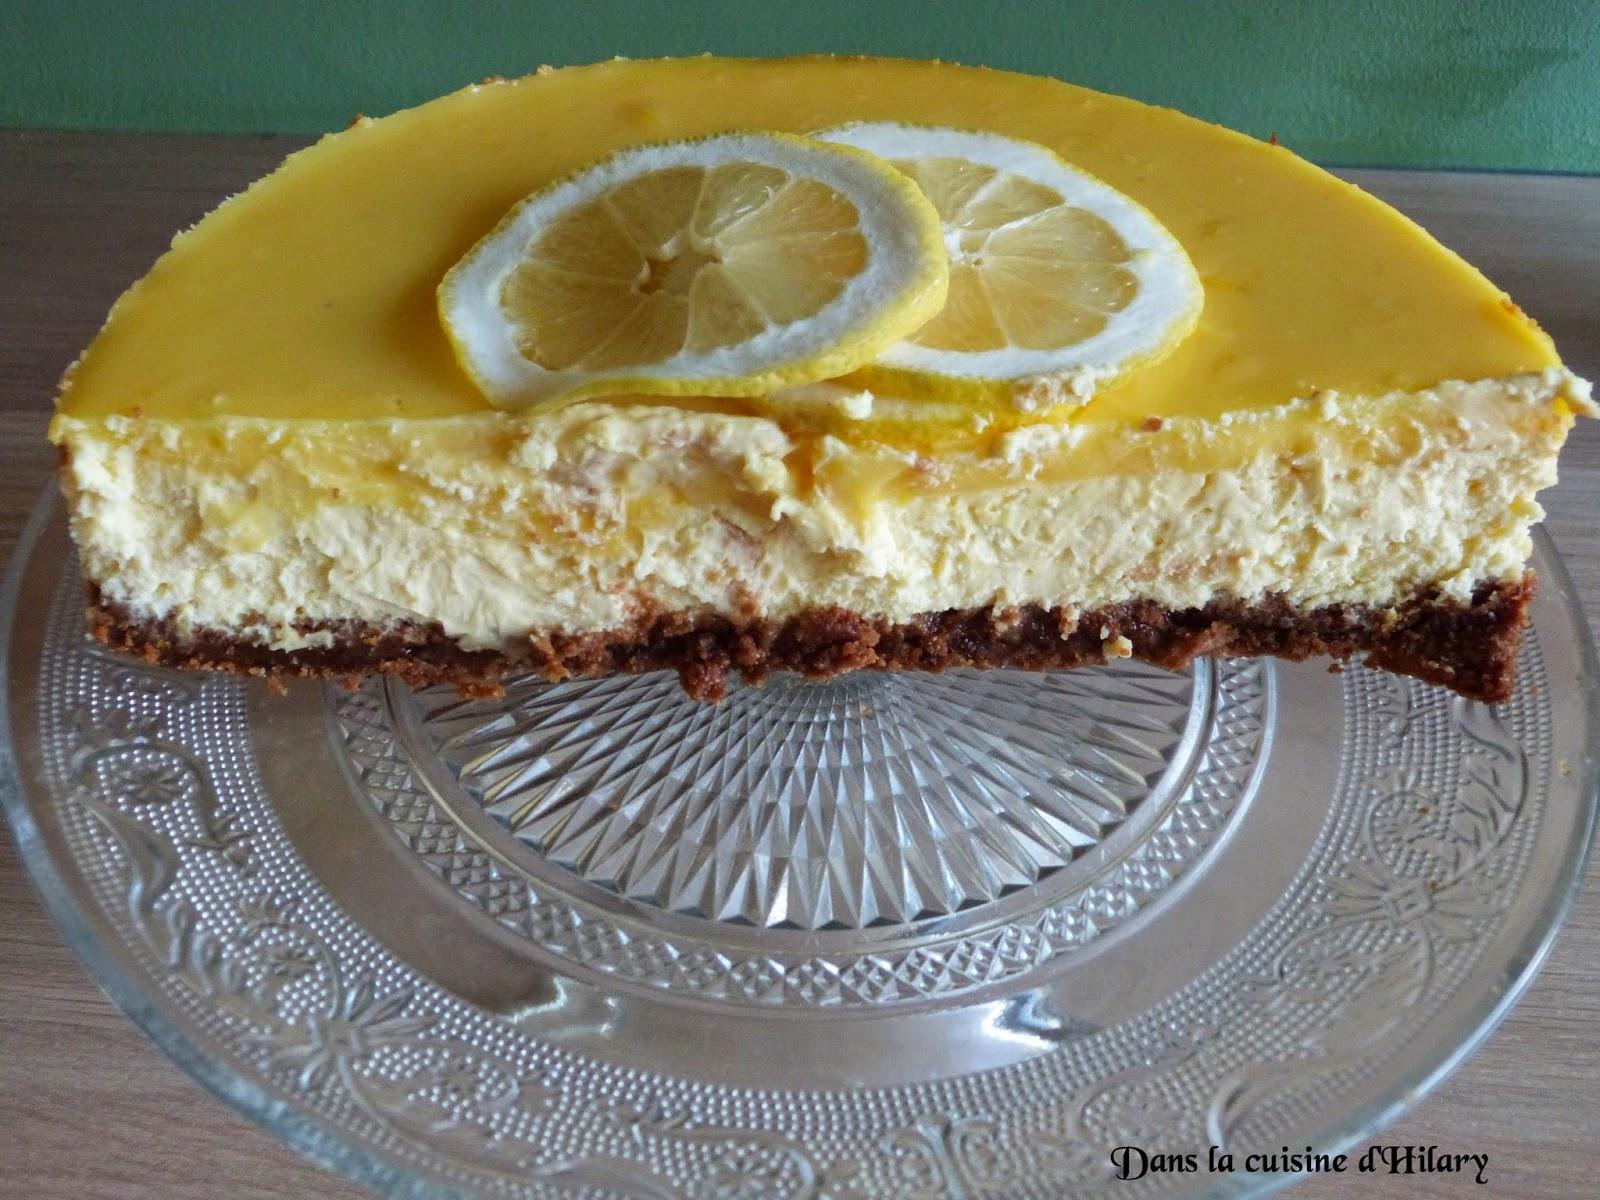 Cheesecake New-Yorkais au citron et son miroir au lemon curd